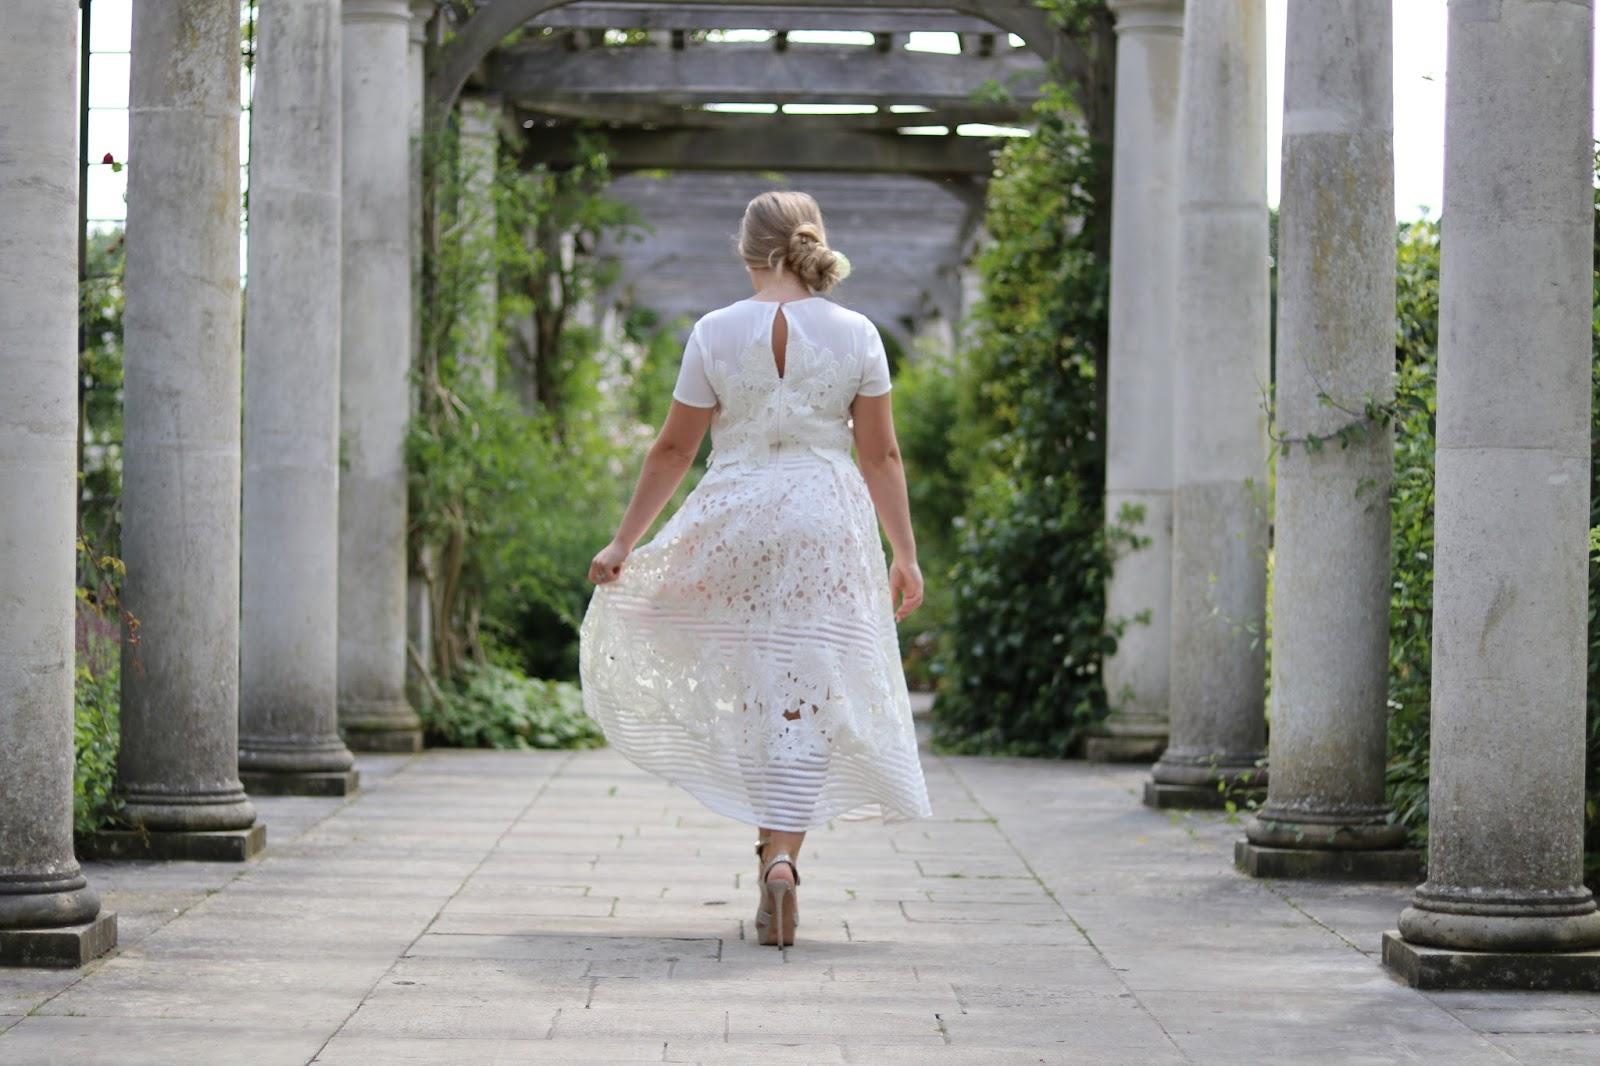 Katie Heath wearing white Janelle Ted Baker Wedding Dress and Kurt Geiger Gold Heels in Hampstead Pergola, London